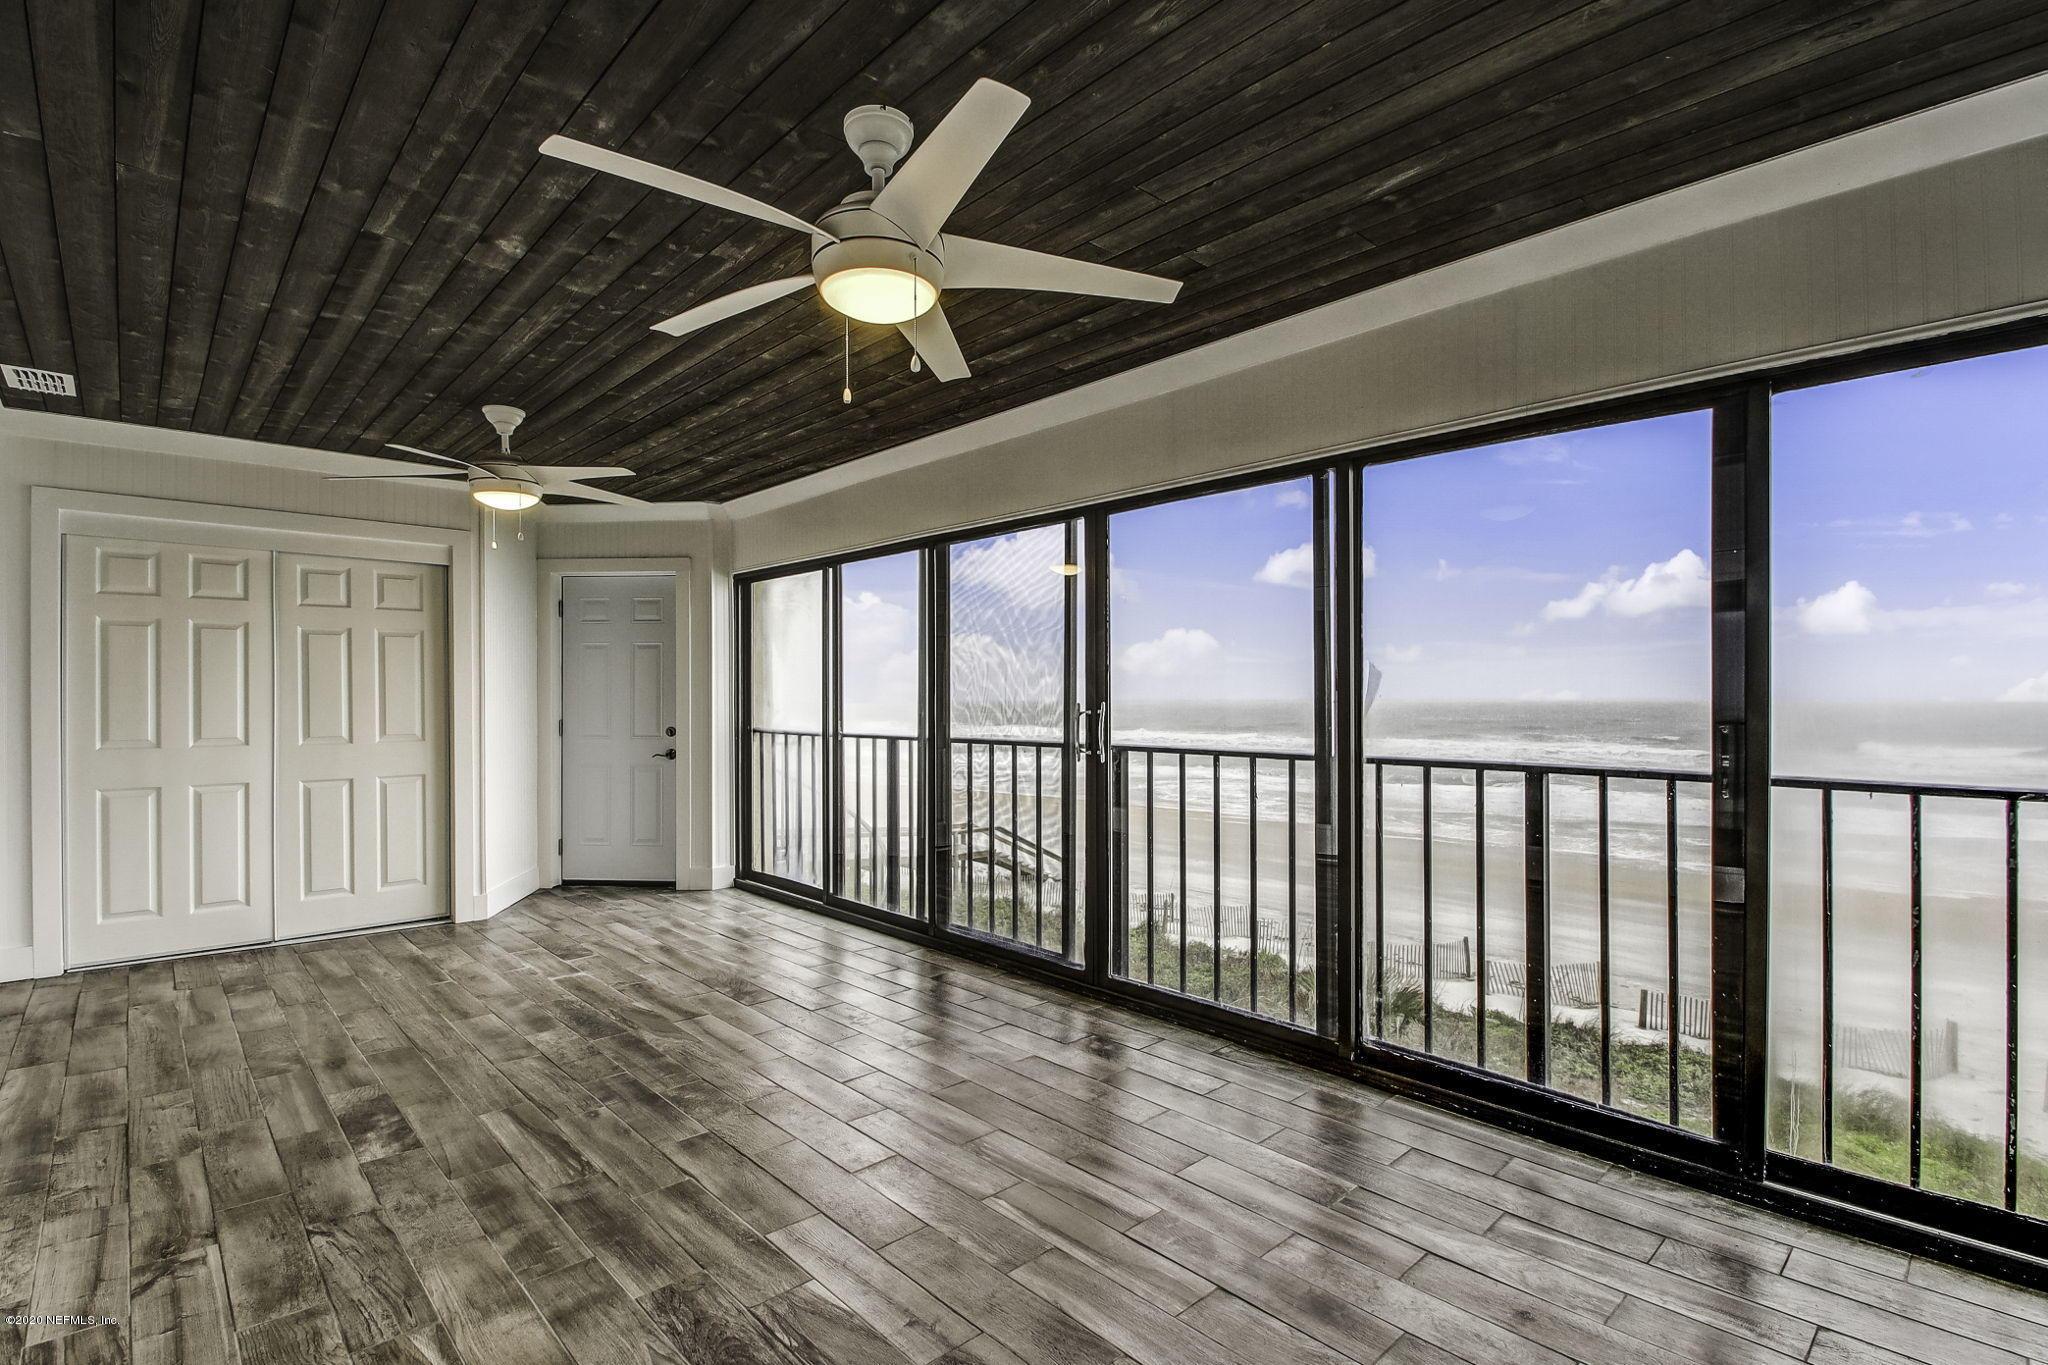 663 PONTE VEDRA, PONTE VEDRA BEACH, FLORIDA 32082, 2 Bedrooms Bedrooms, ,2 BathroomsBathrooms,Rental,For Rent,PONTE VEDRA,1037610